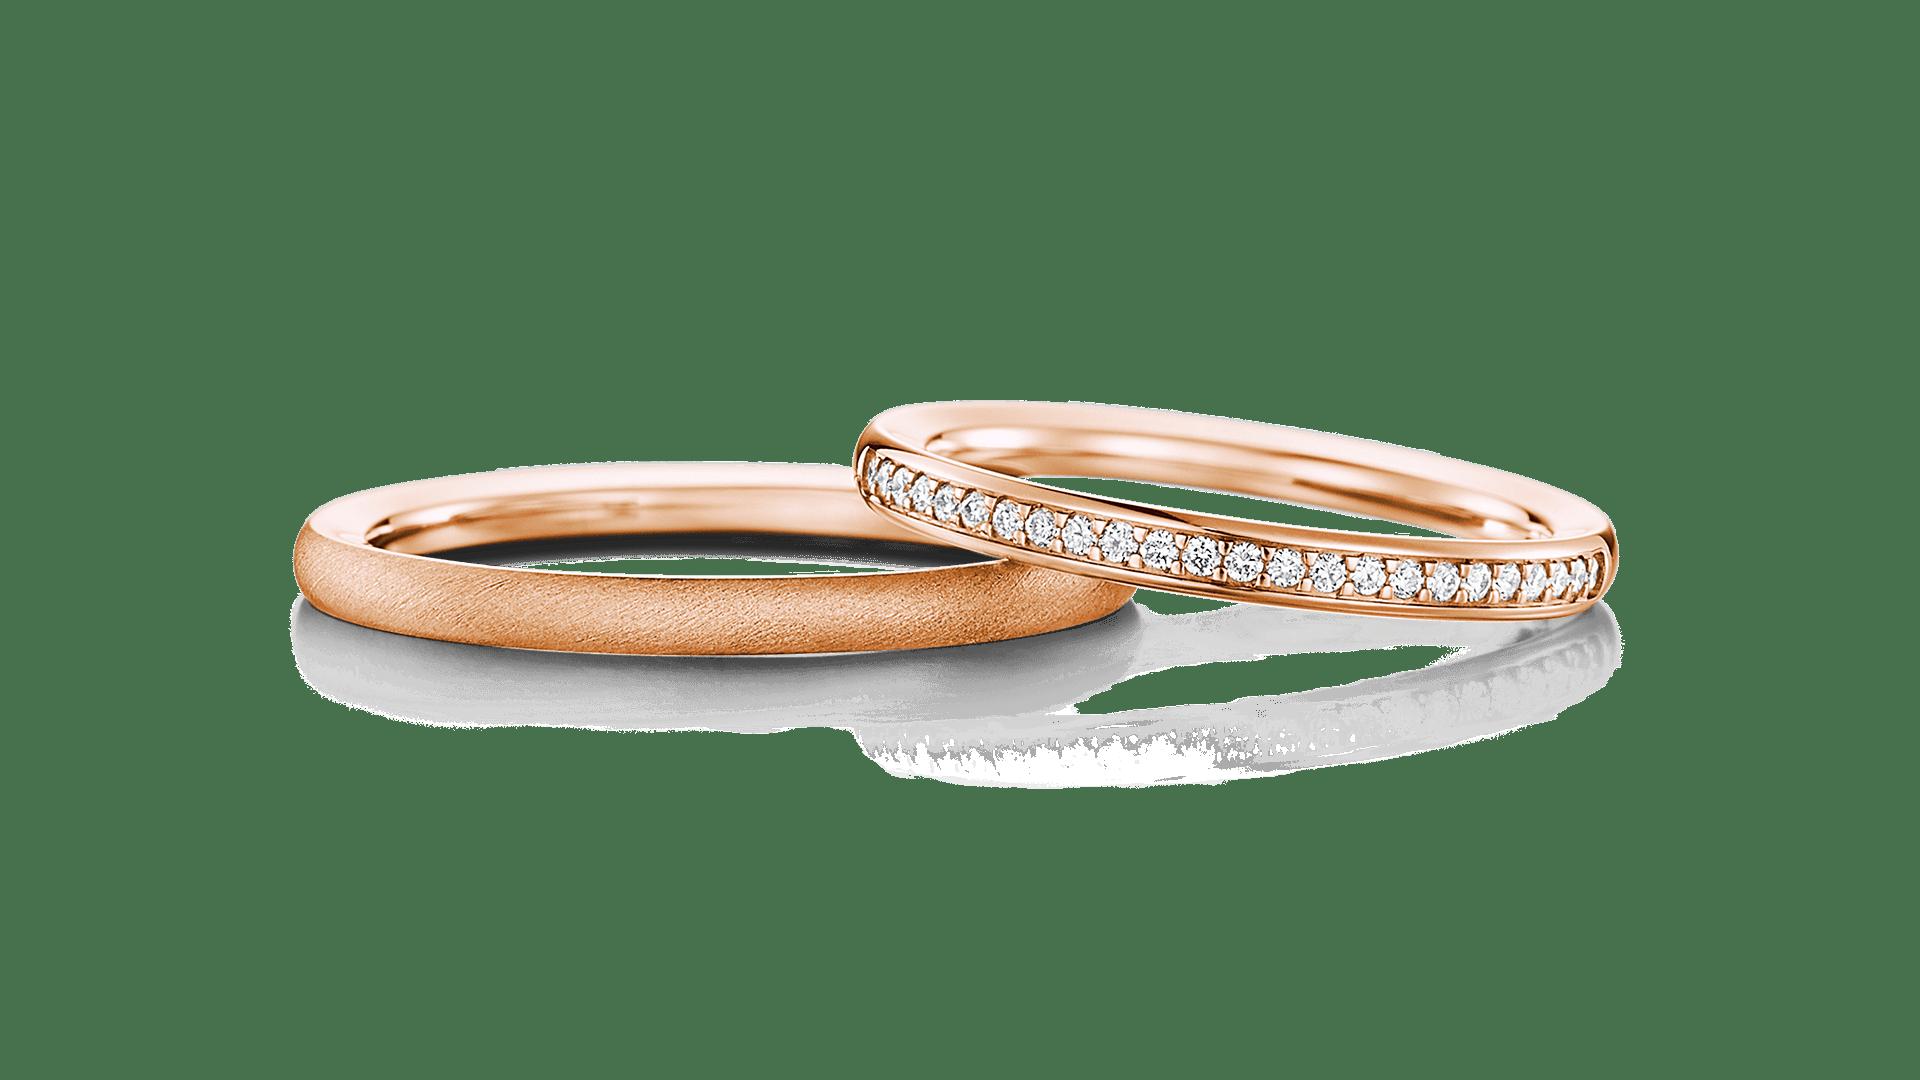 astra H × DR24 アストラH×DR24 | 結婚指輪サムネイル 1